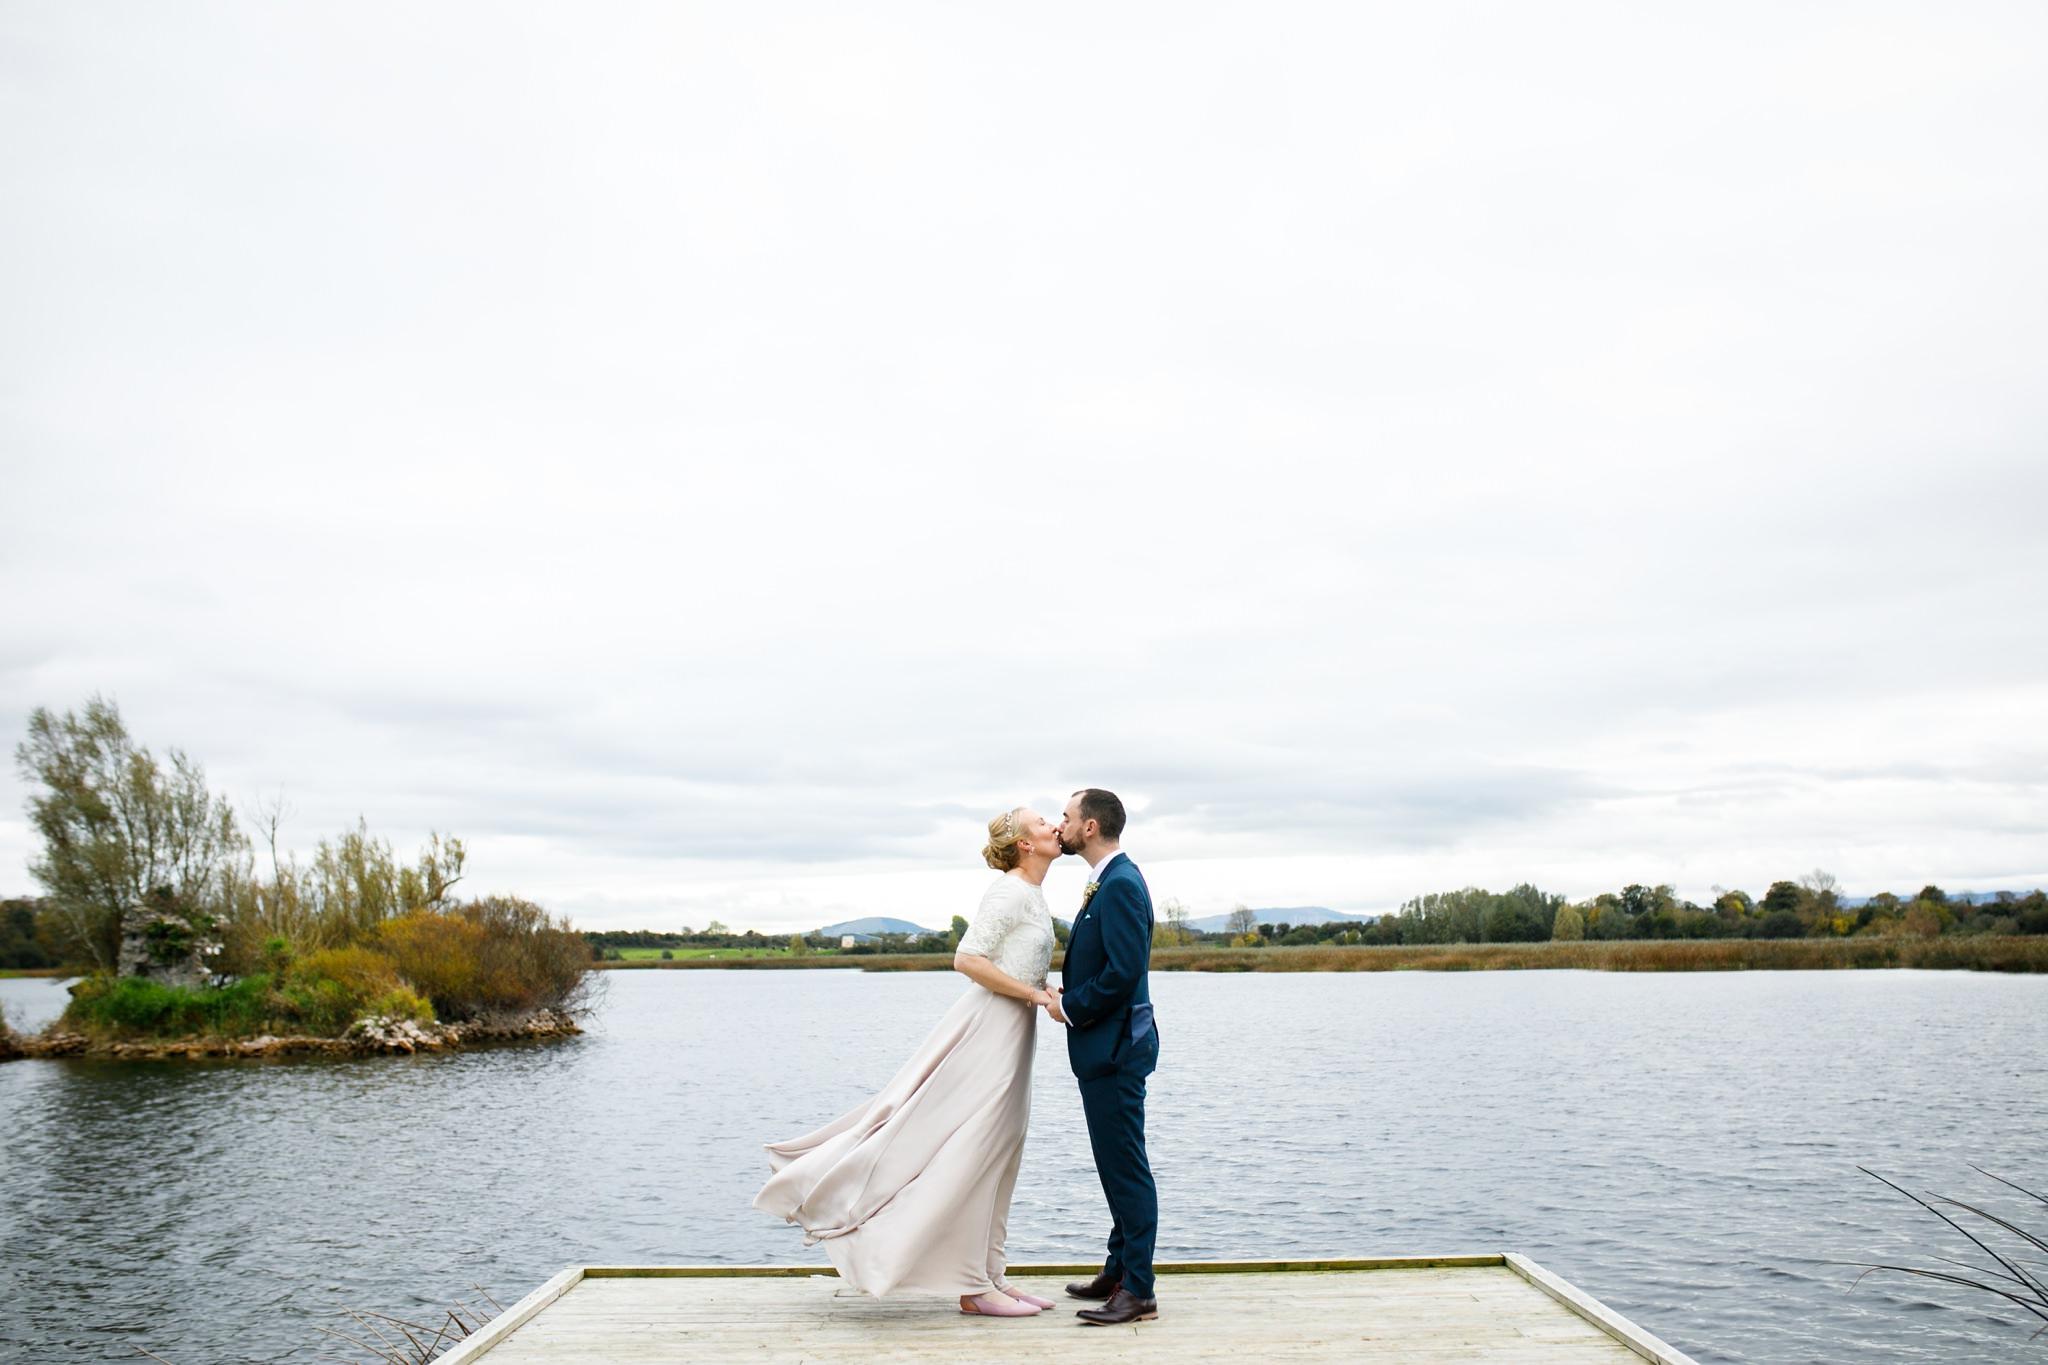 Elisha-Clarke-Photography-Dublin-City-Wedding_0085.jpg